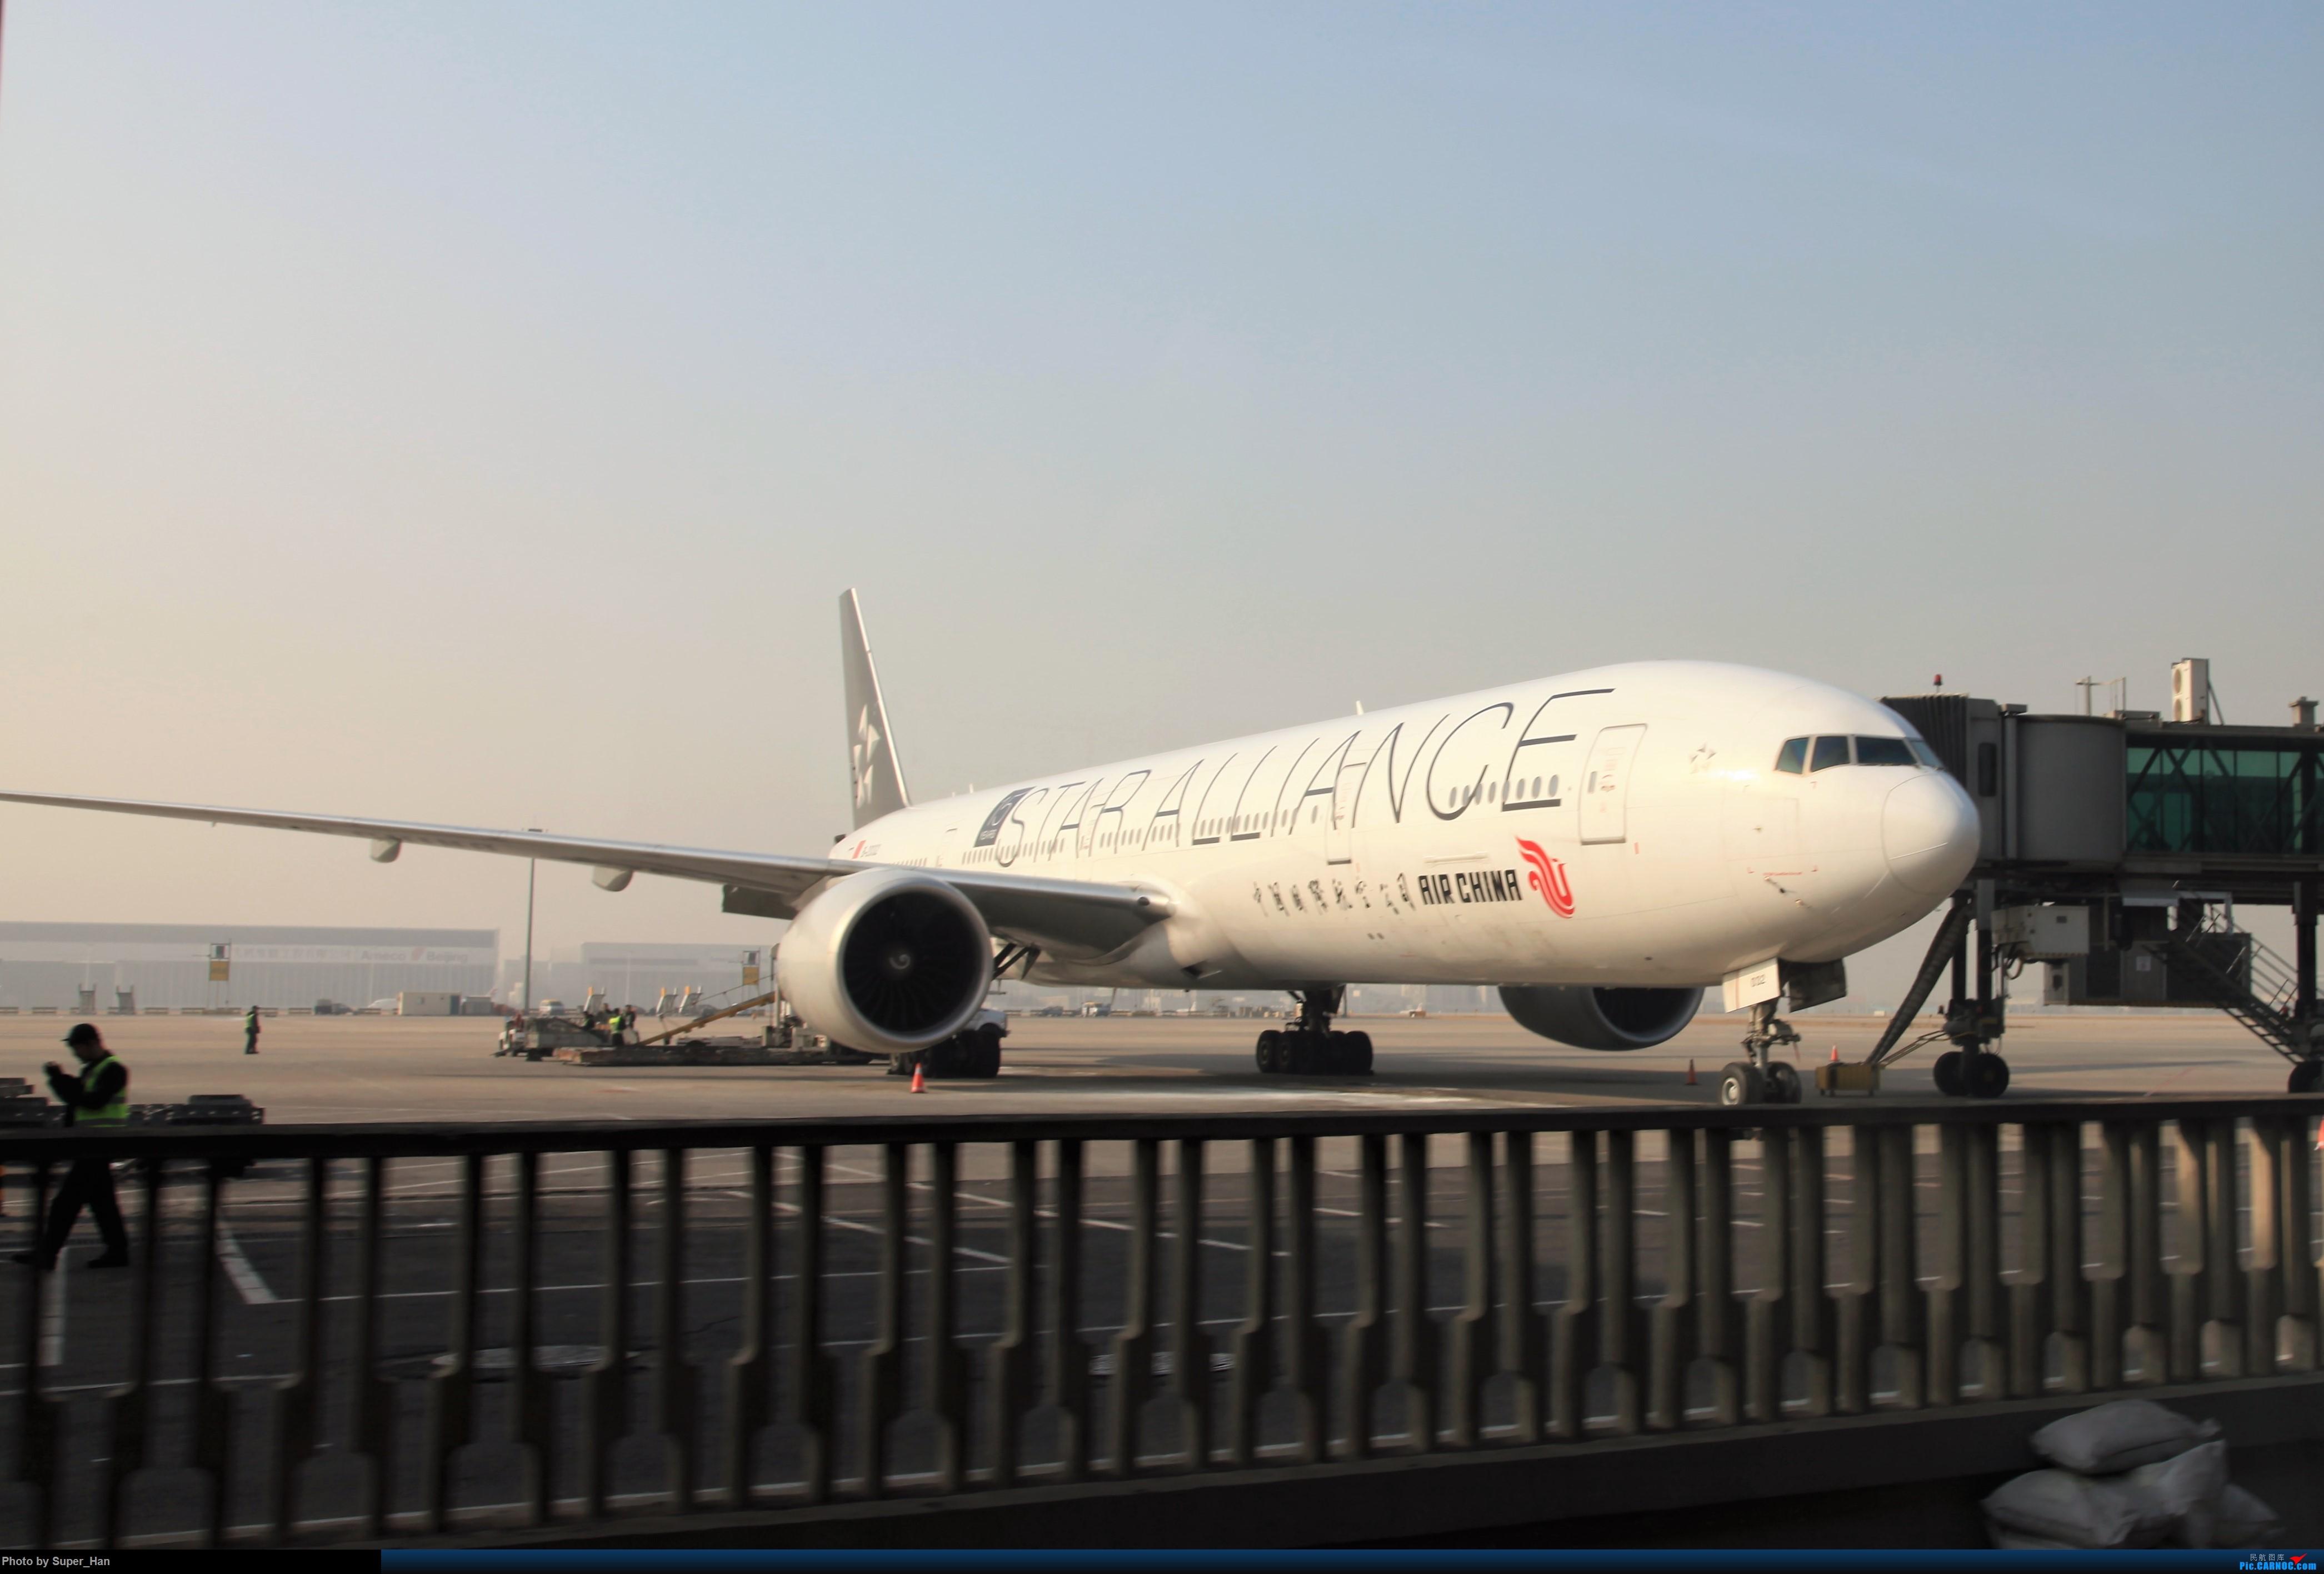 Re:[原创]2019虹桥出发飞北京第一拍 BOEING 777-300ER B-2032 中国北京首都国际机场